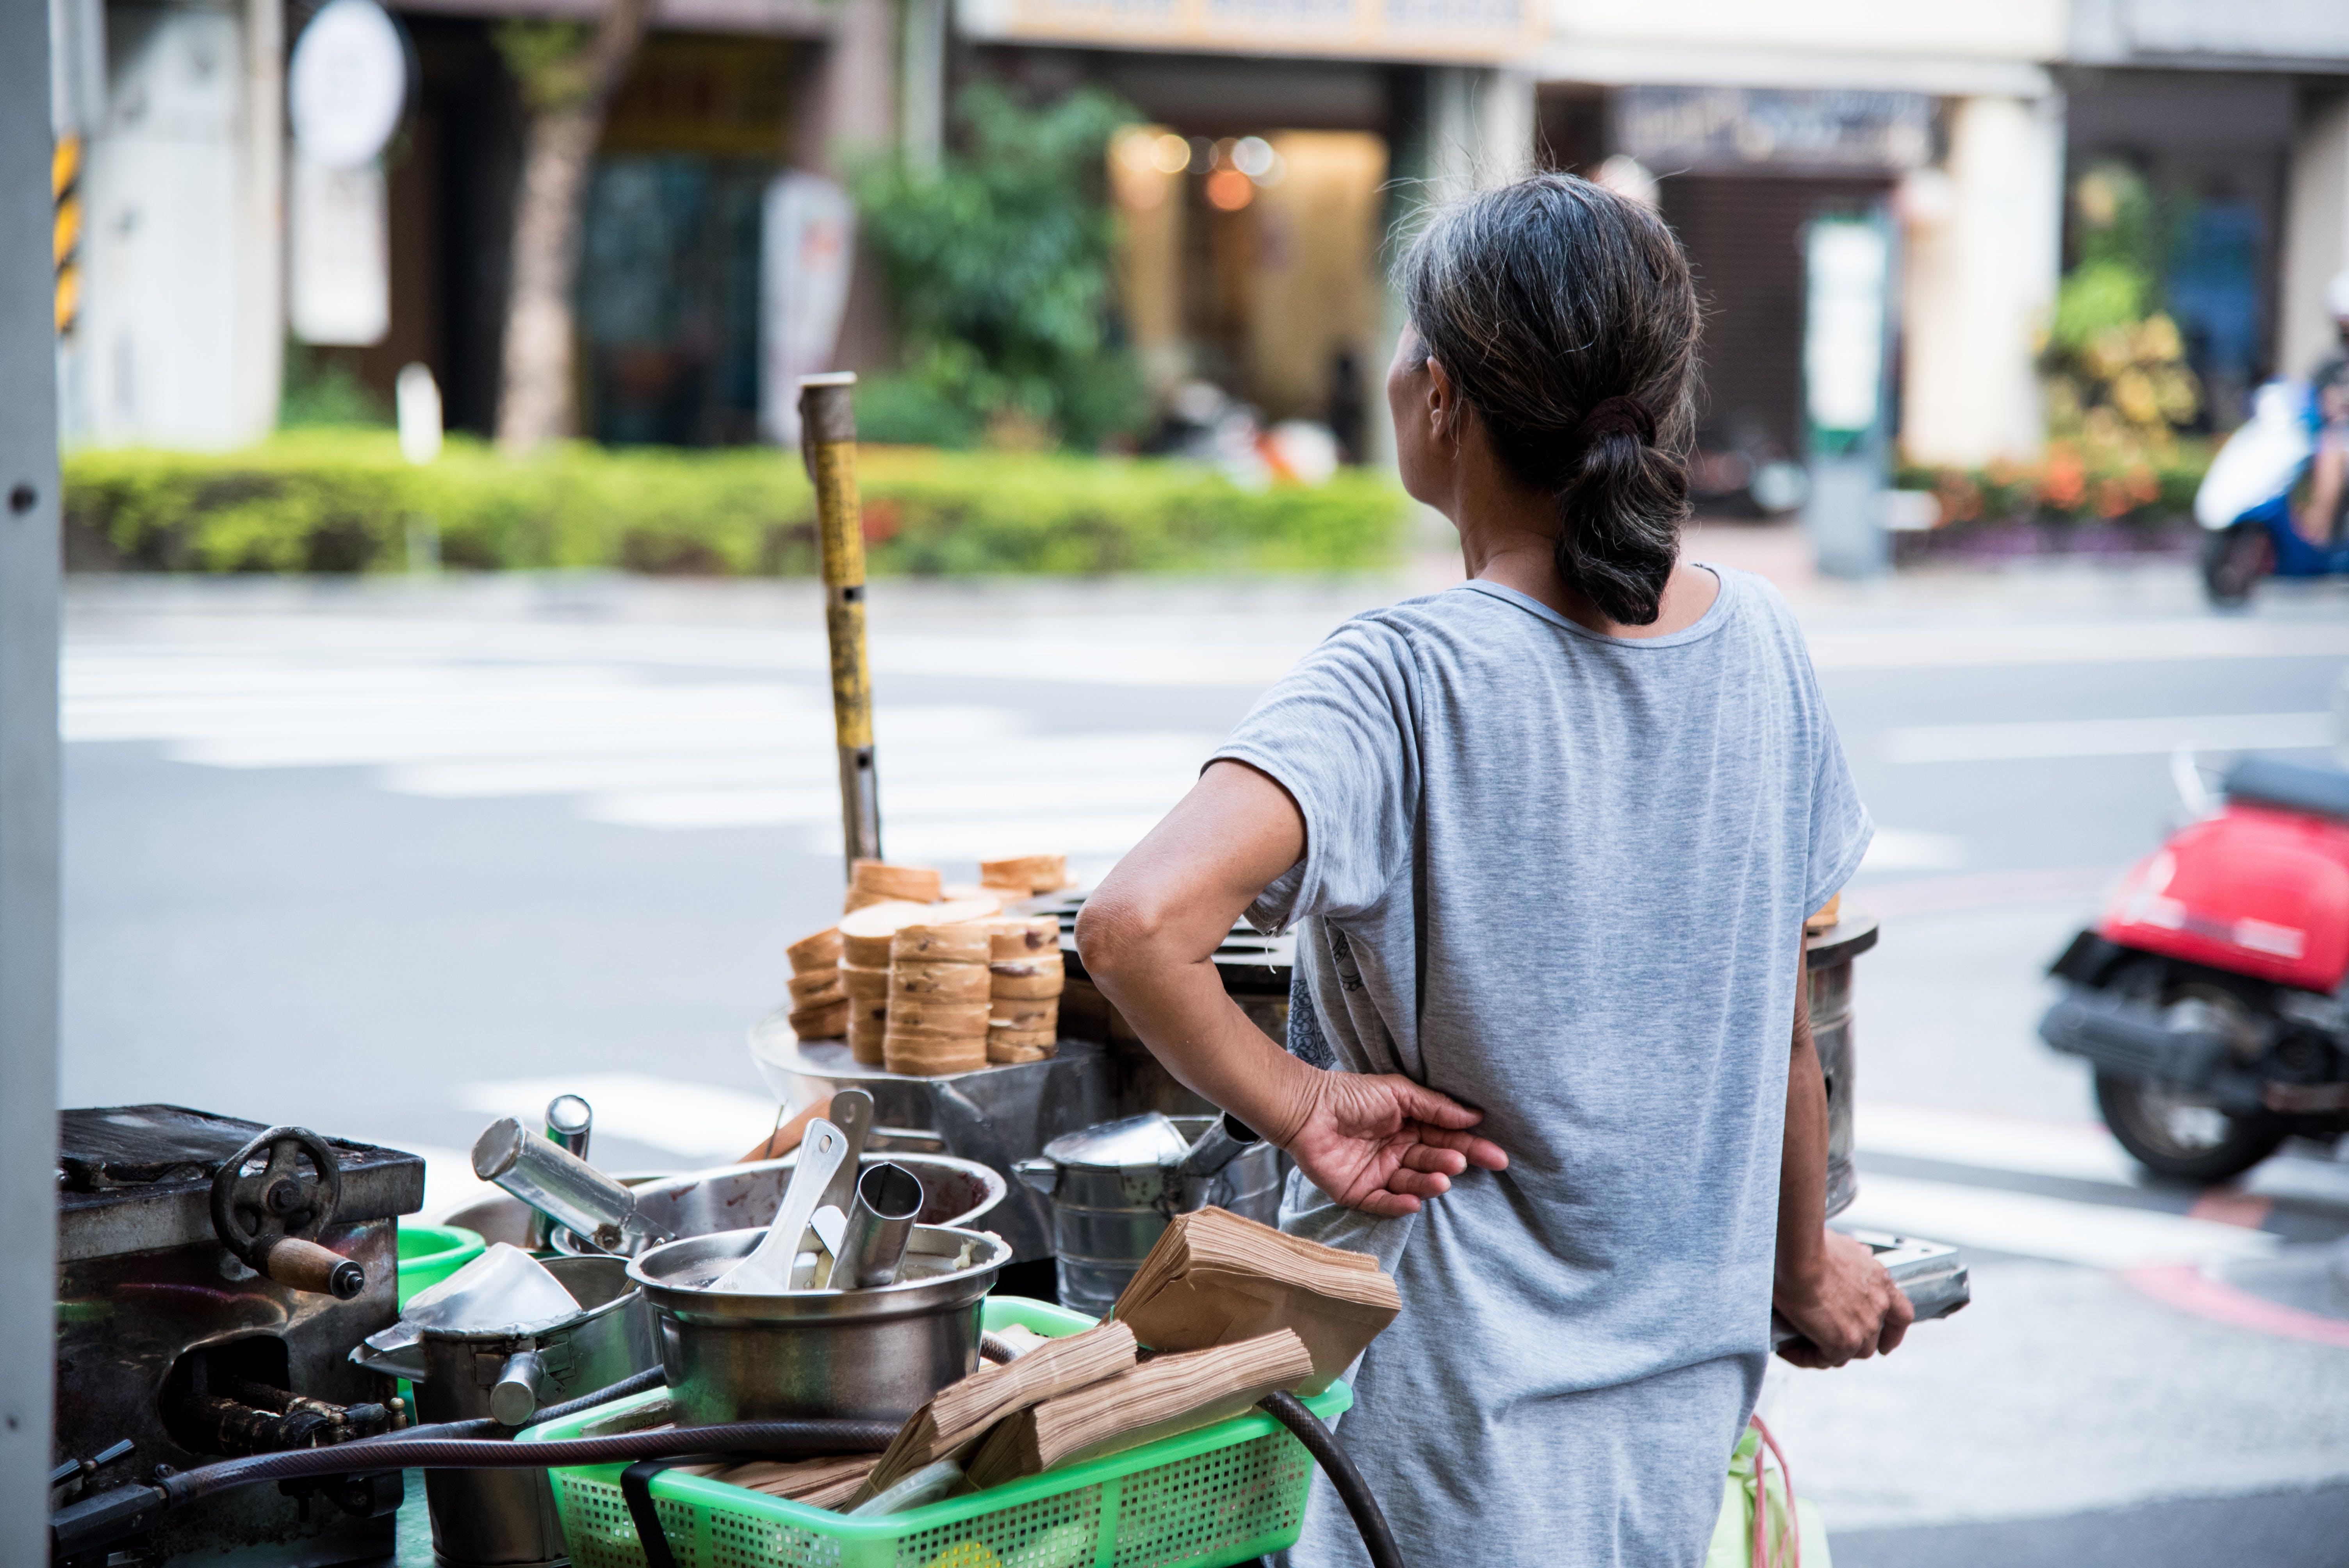 Woman Wearing Gray Shirt Standing Beside Food Cart